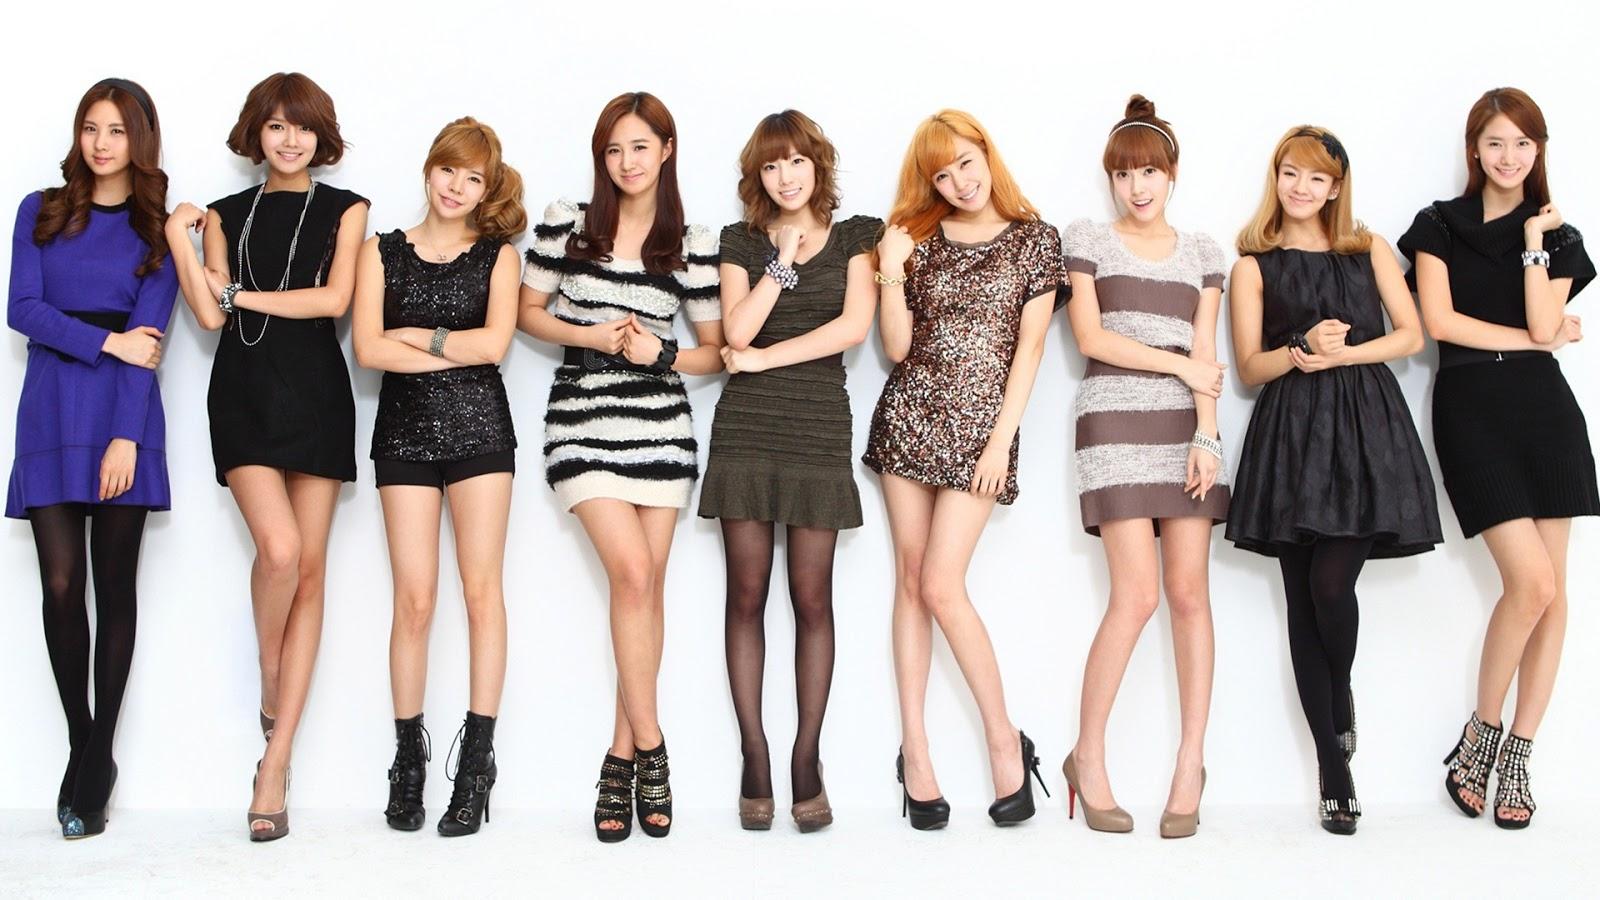 girls generation hd - photo #23